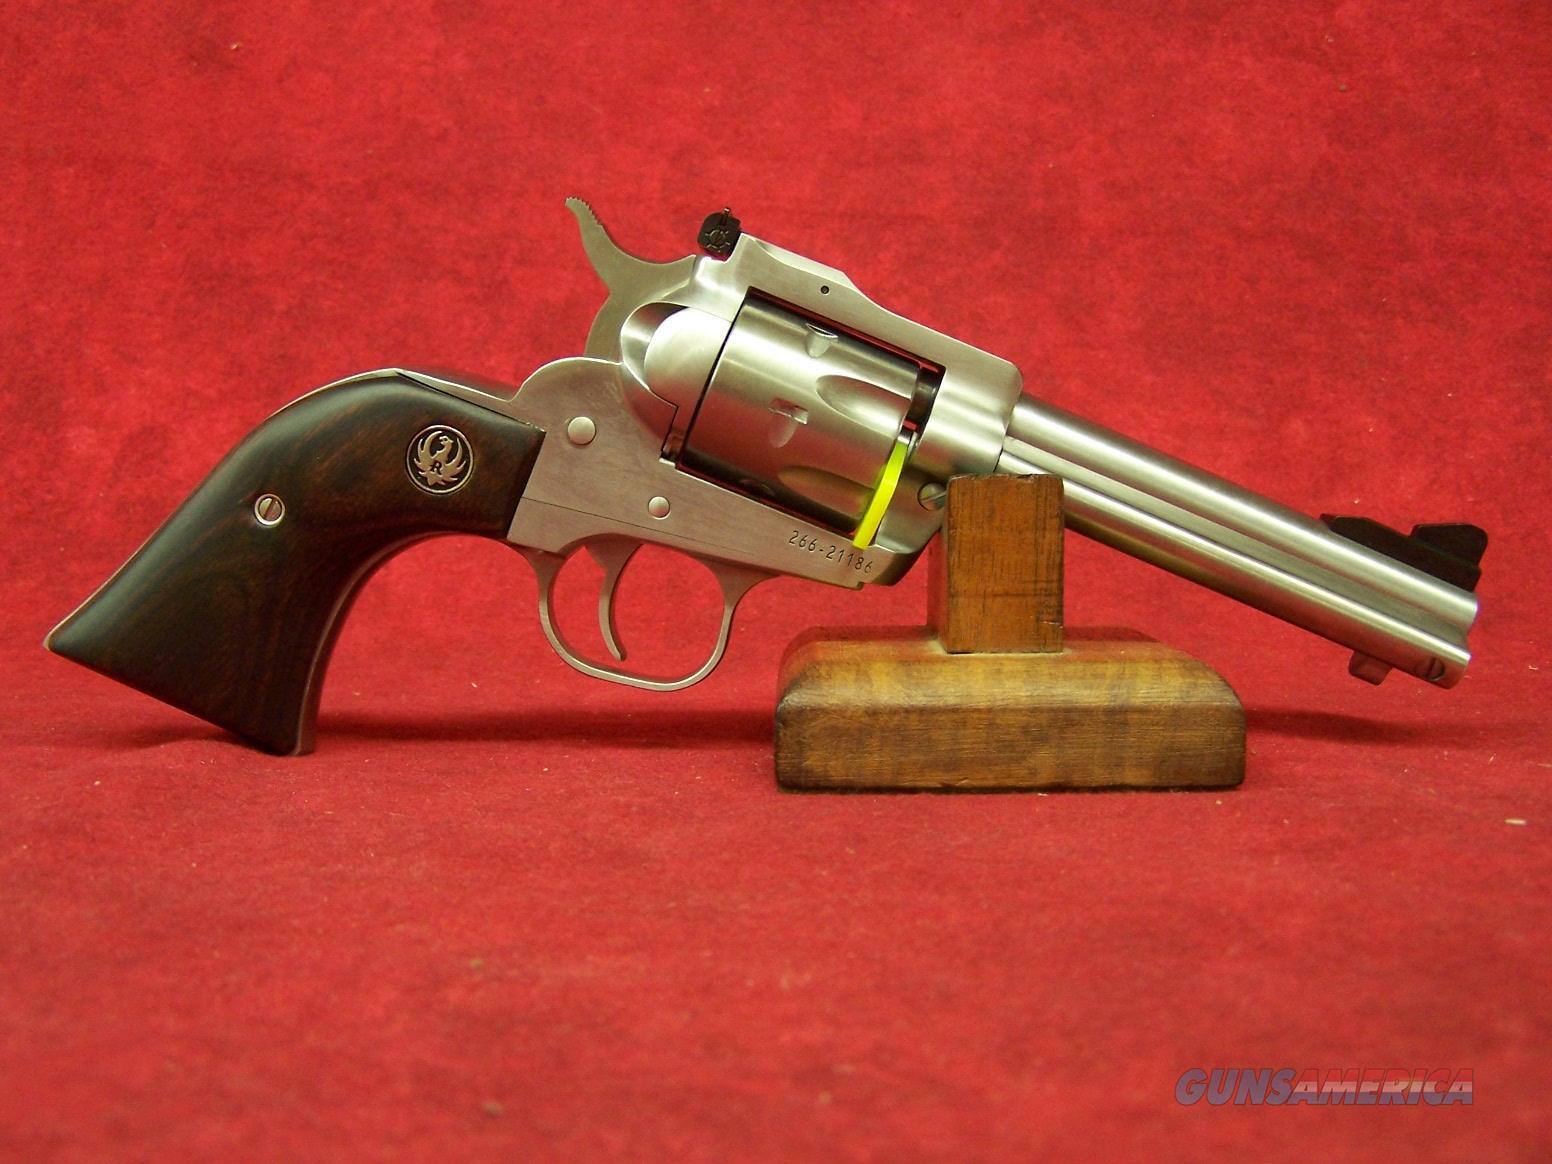 Ruger New Model Single Six .22LR/.22 Mag 4-5/8 Barrel (00627)  Guns > Pistols > Ruger Single Action Revolvers > Single Six Type